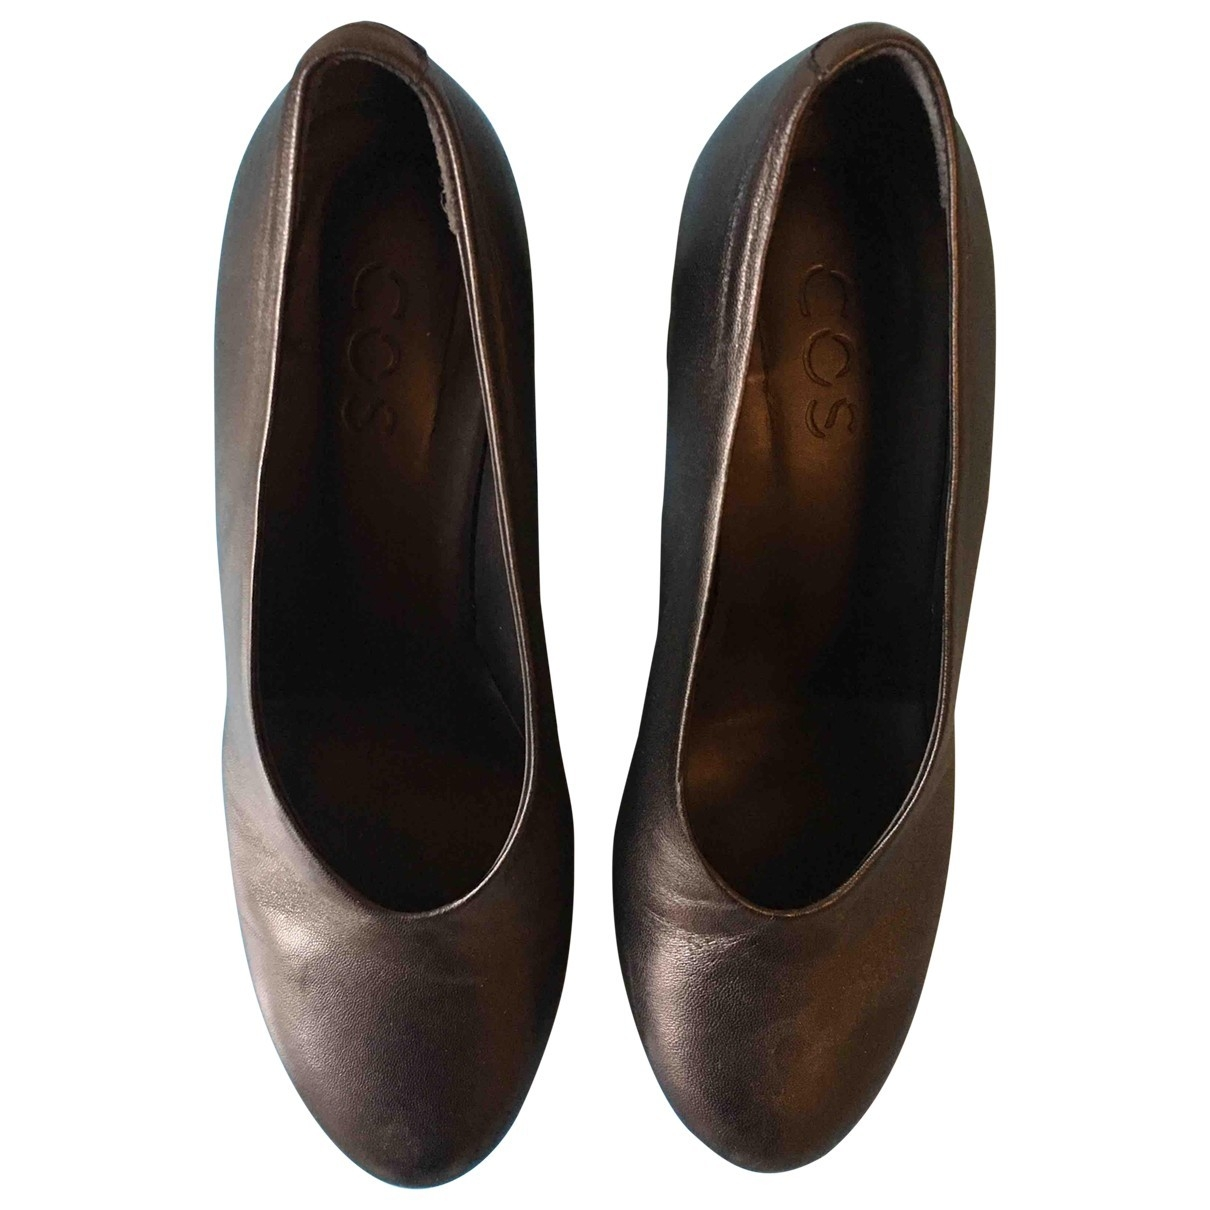 Cos \N Black Leather Heels for Women 39 EU